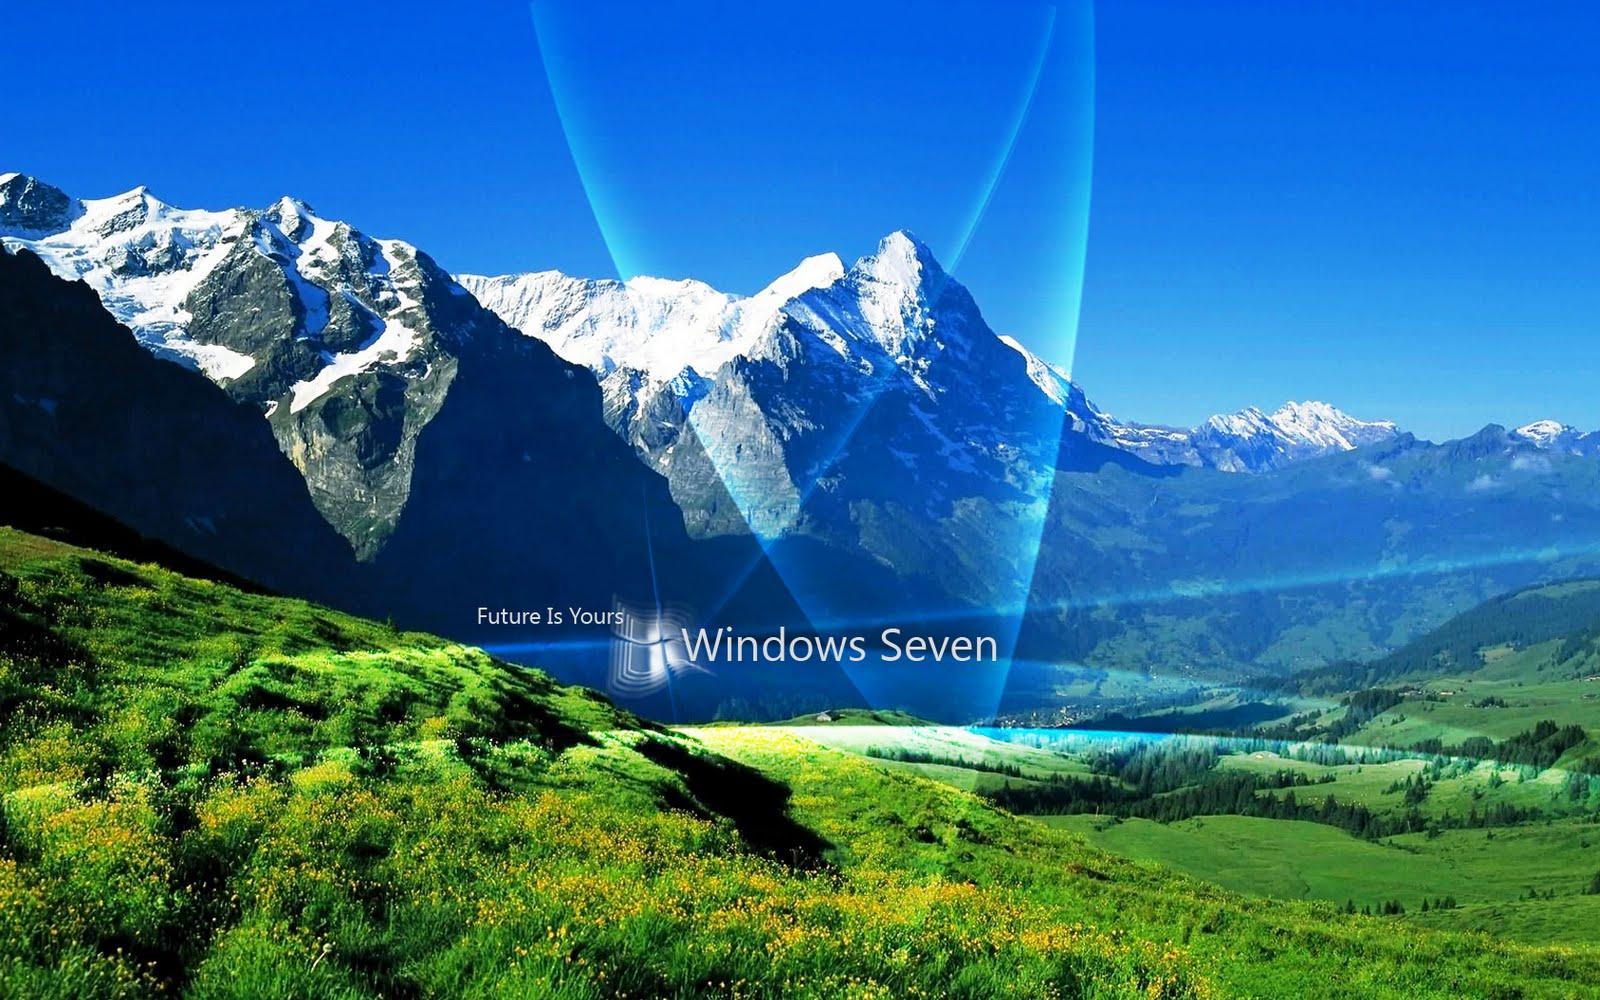 http://1.bp.blogspot.com/_lTuLGFn_qac/TU8czaPyj7I/AAAAAAAABmY/ZlVwLGTFCL4/s1600/windows-7-future-is-yours-wallpaper.jpg